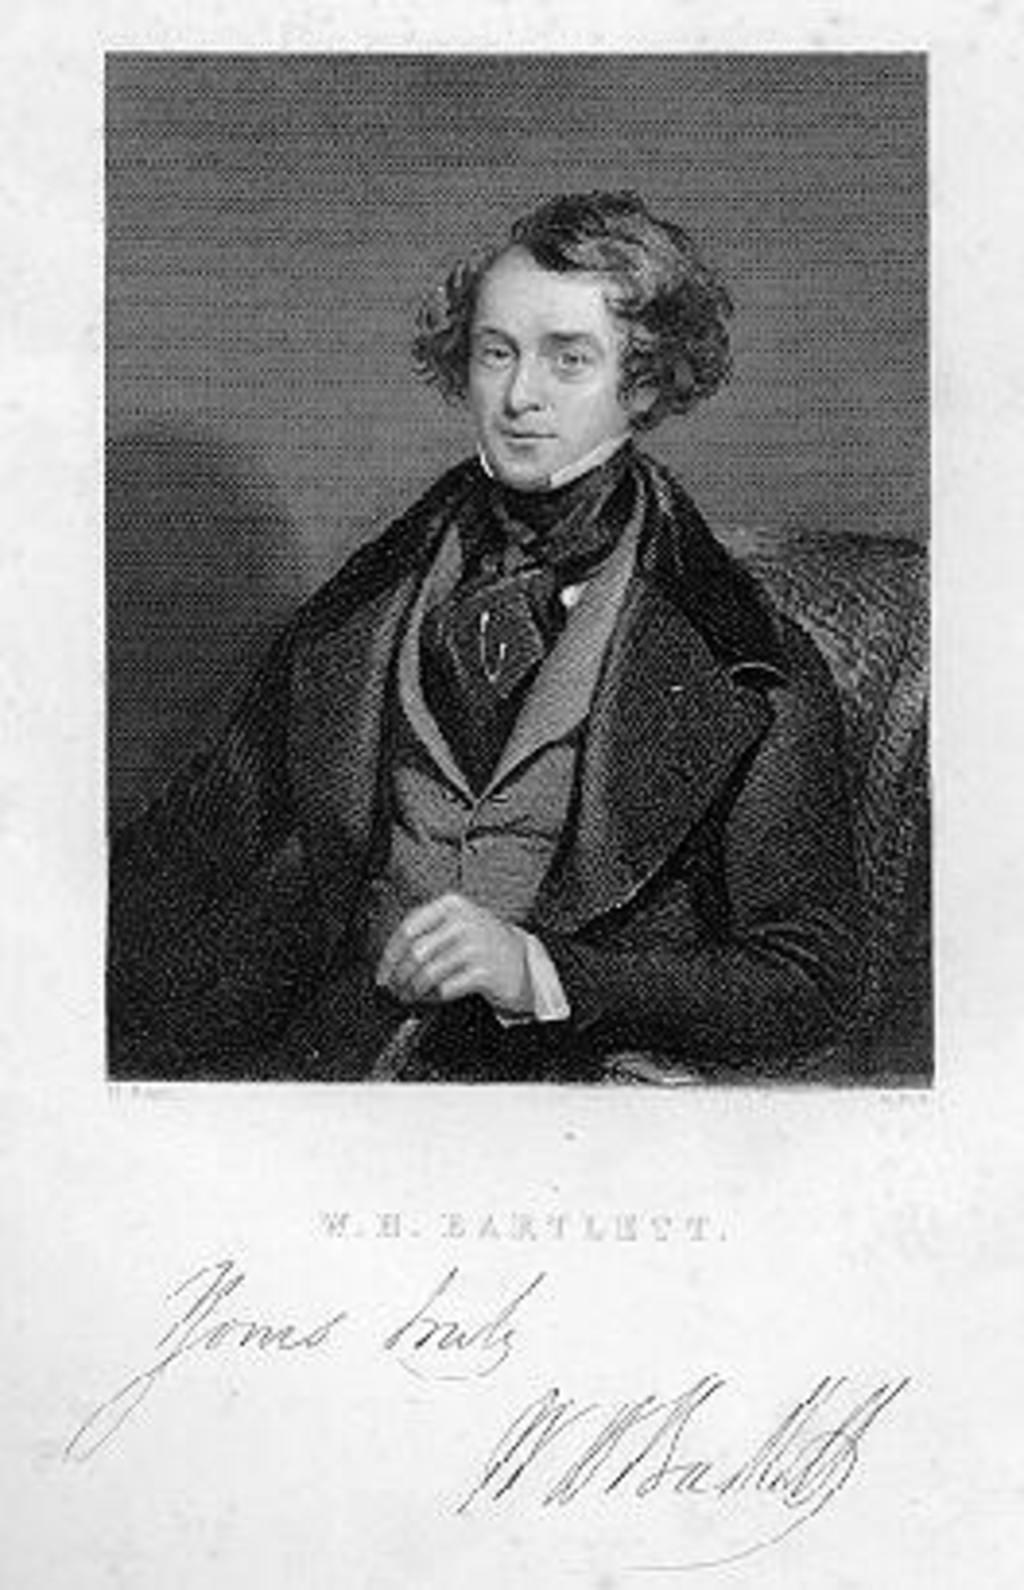 Bartlett, William Henry